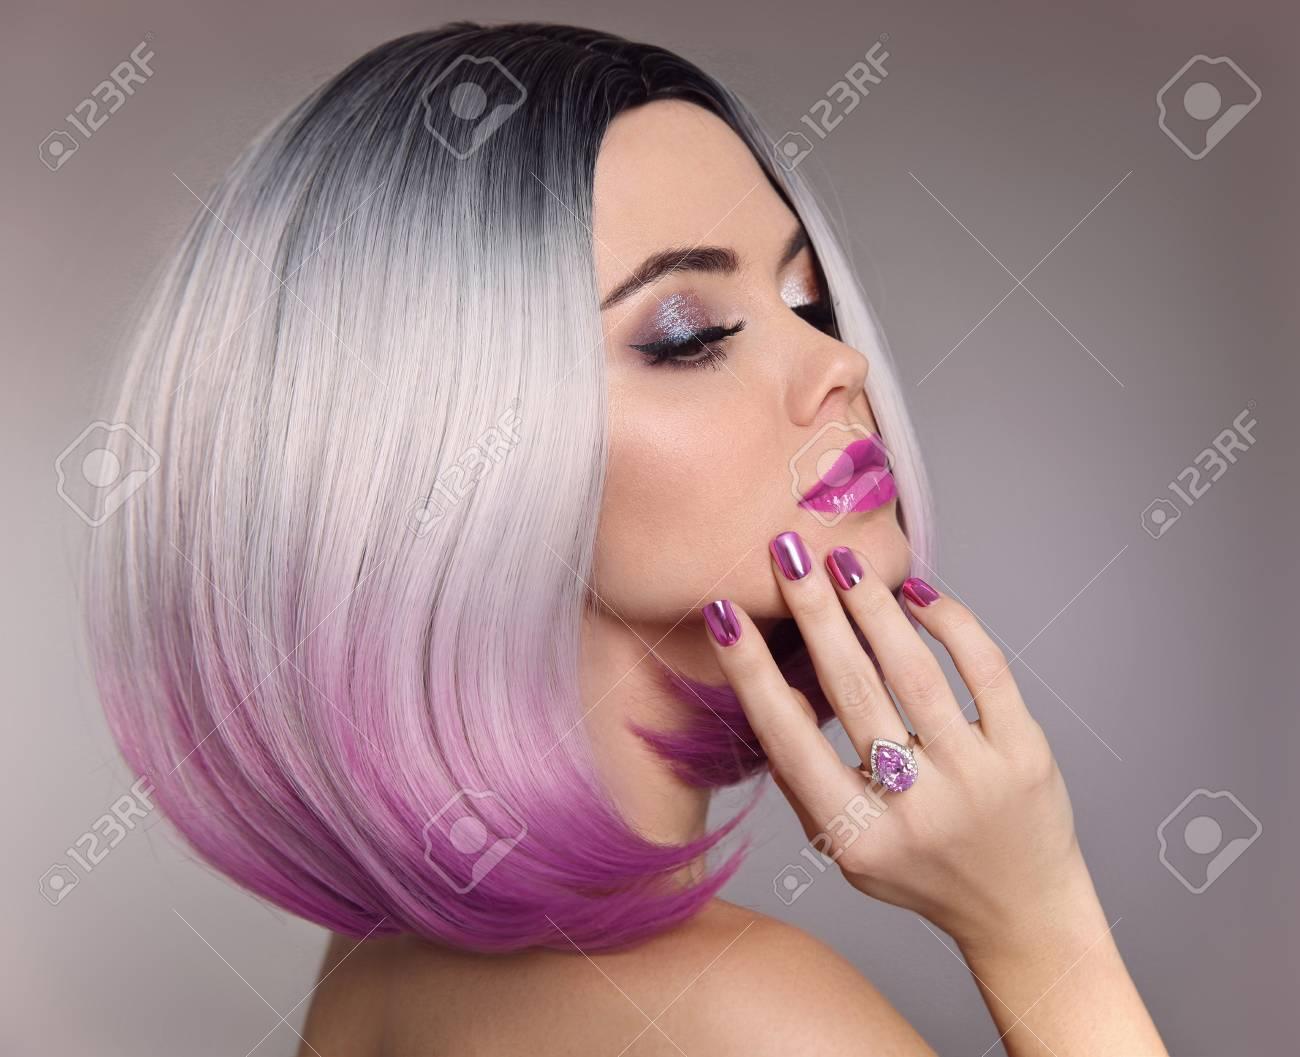 Ombre Bob Hair Woman Glitter Makeup Manicure Nails Beauty Stock